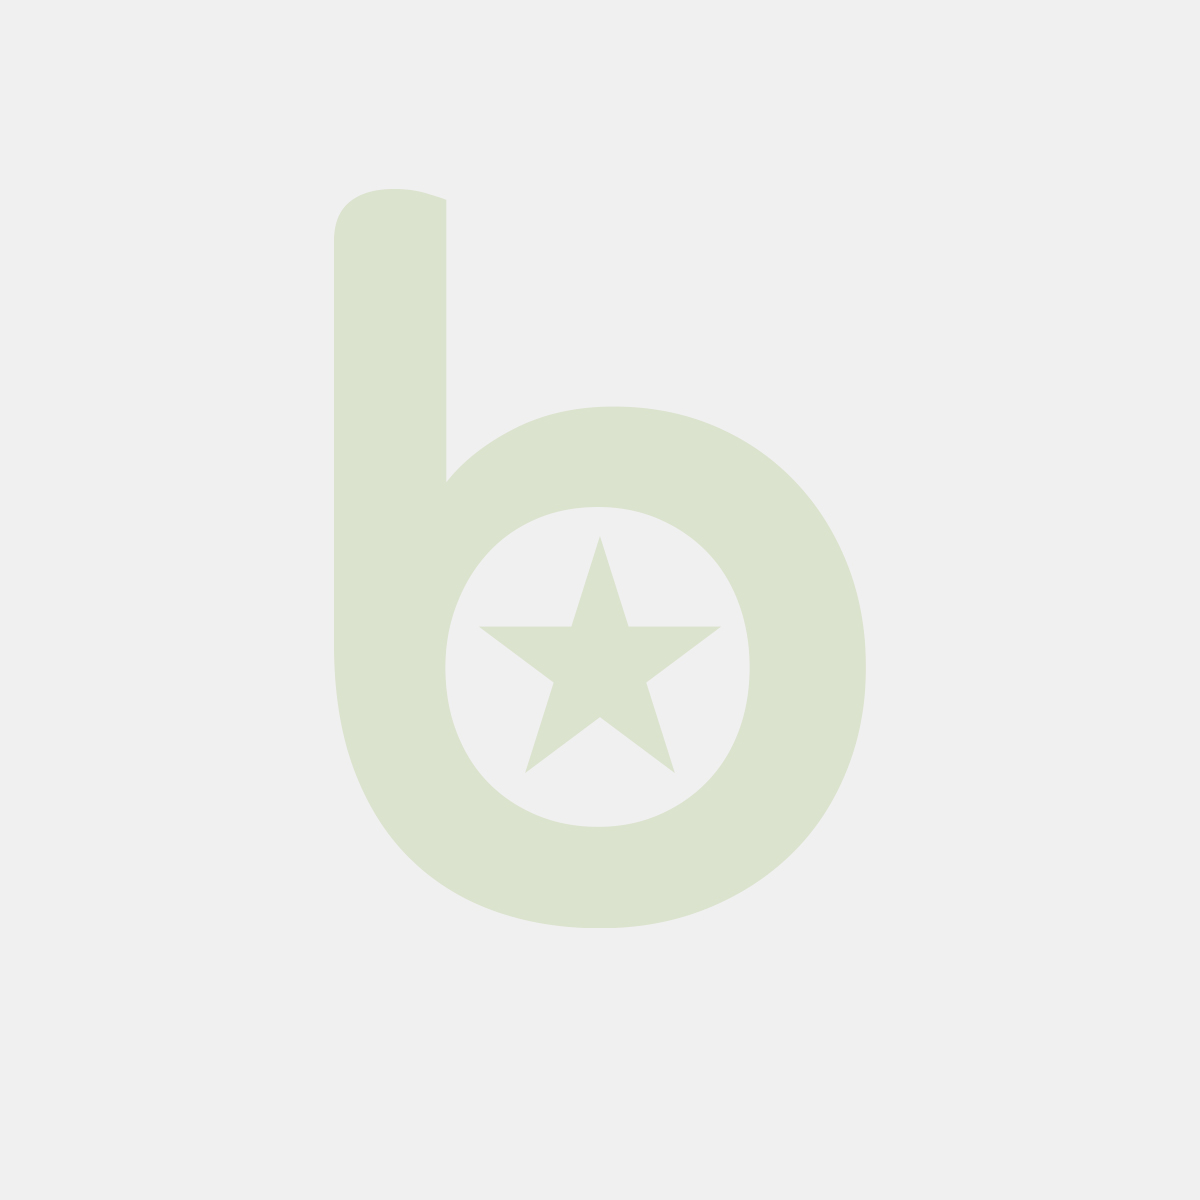 Rondel Kitchen Line Bez Pokrywki 1,5 L; Śr. 160 X 75 H